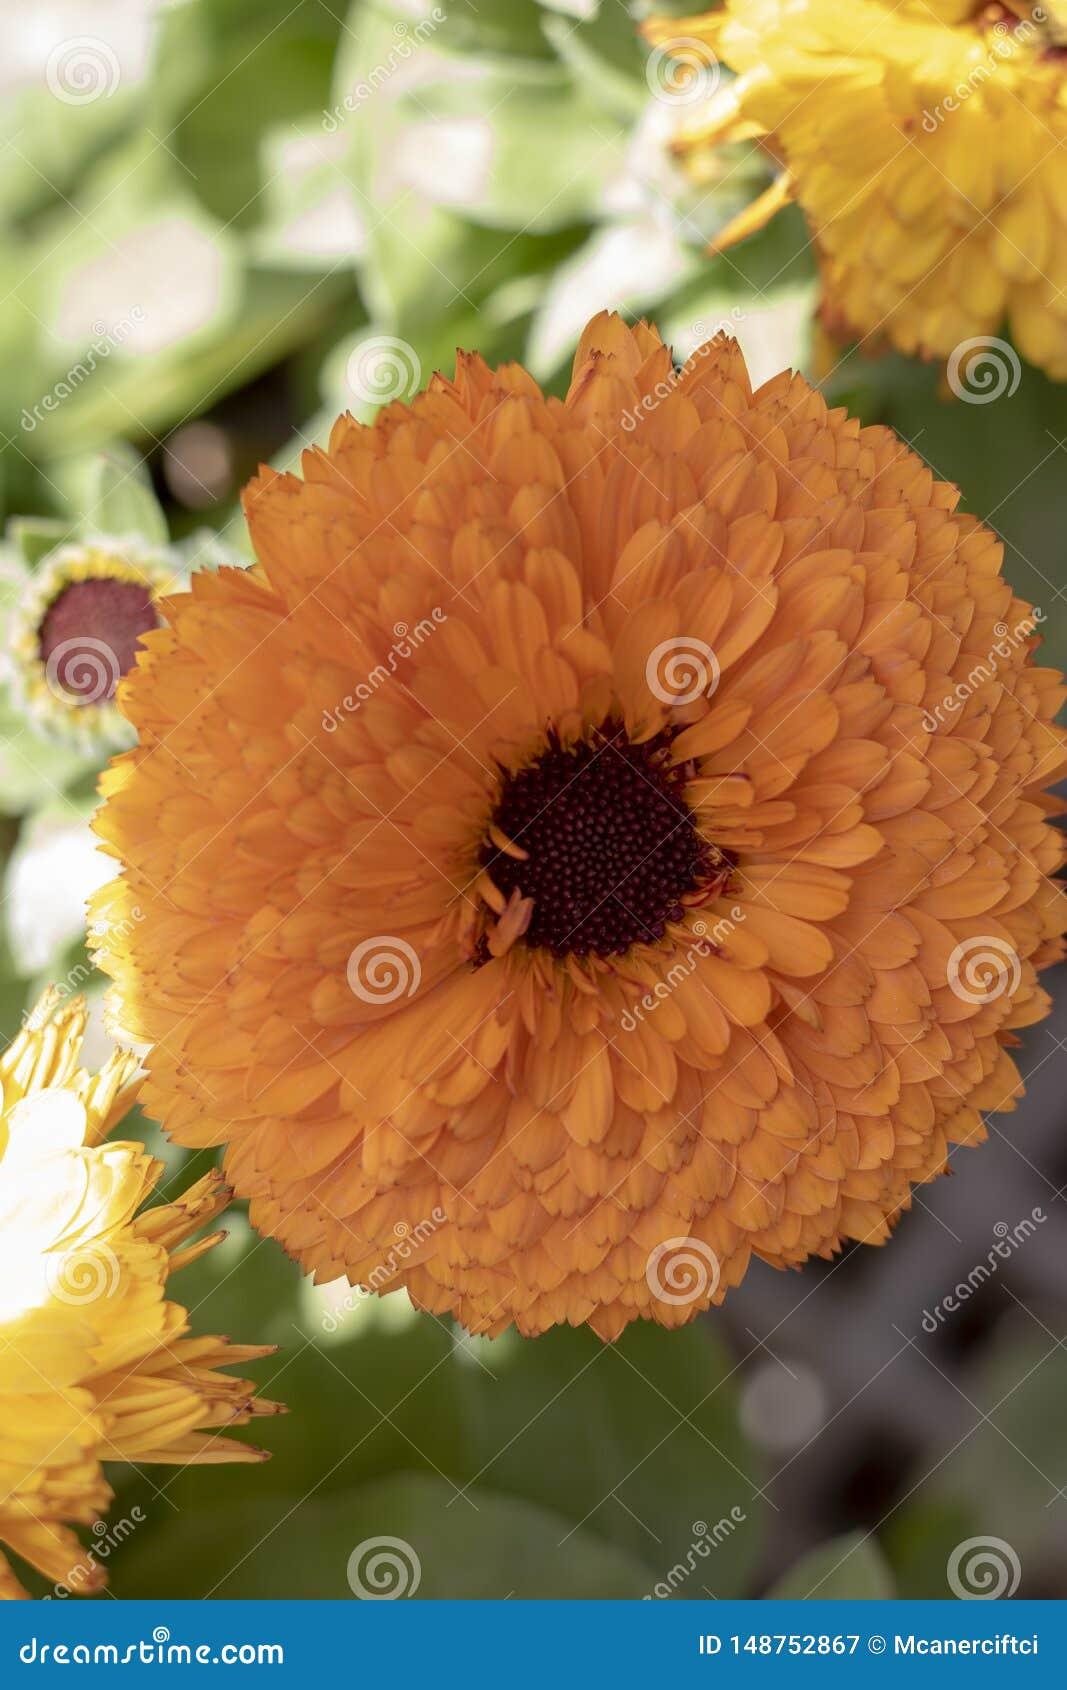 close up of english marigold flower.